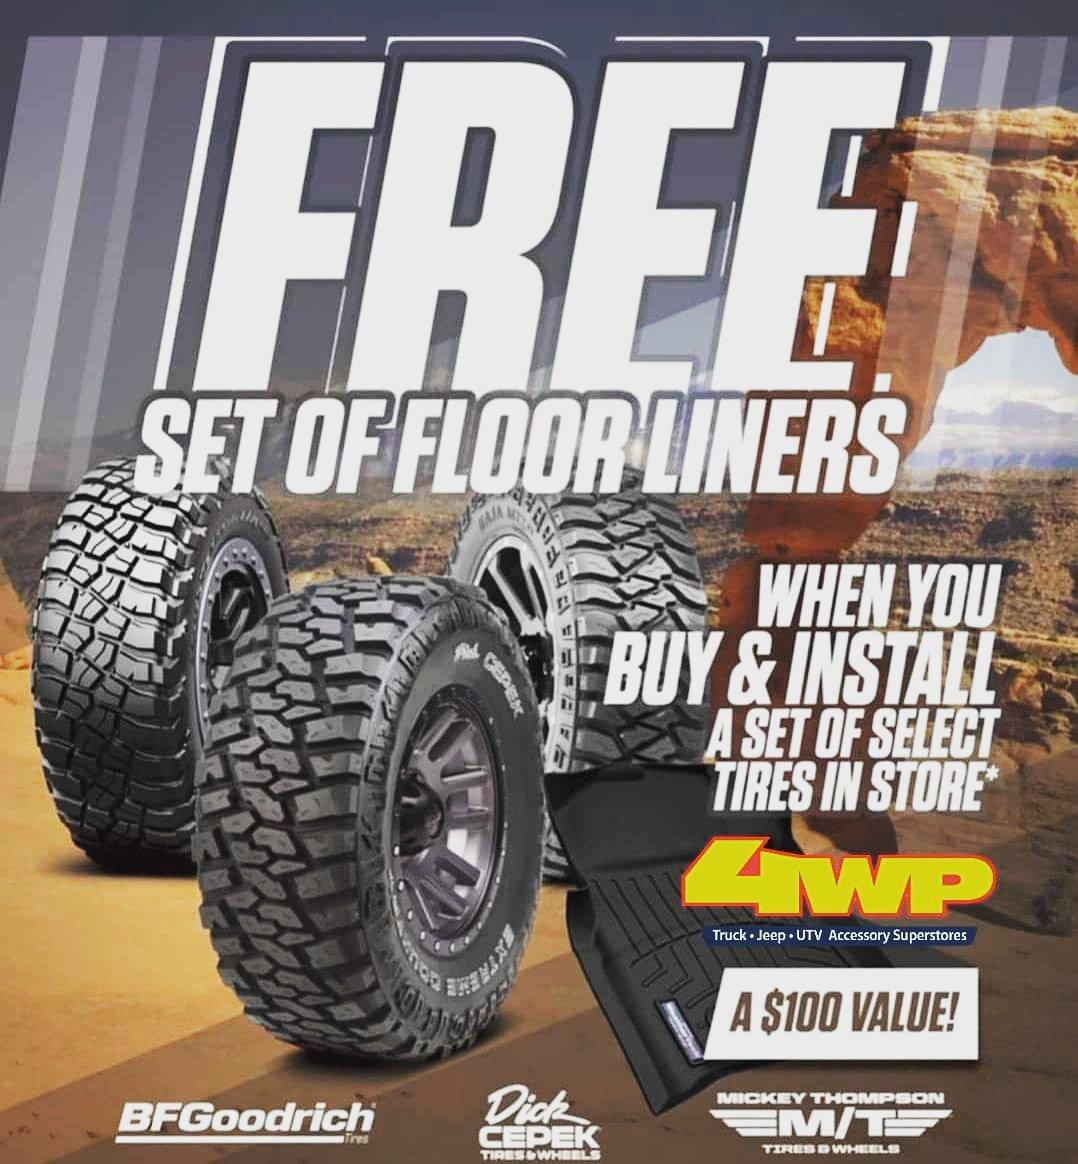 Tires Best Wheels And Tires For Jeeps Trucks 4wp 4 Wheel Parts >> 4 Wheel Parts 4wpsanantonio Twitter